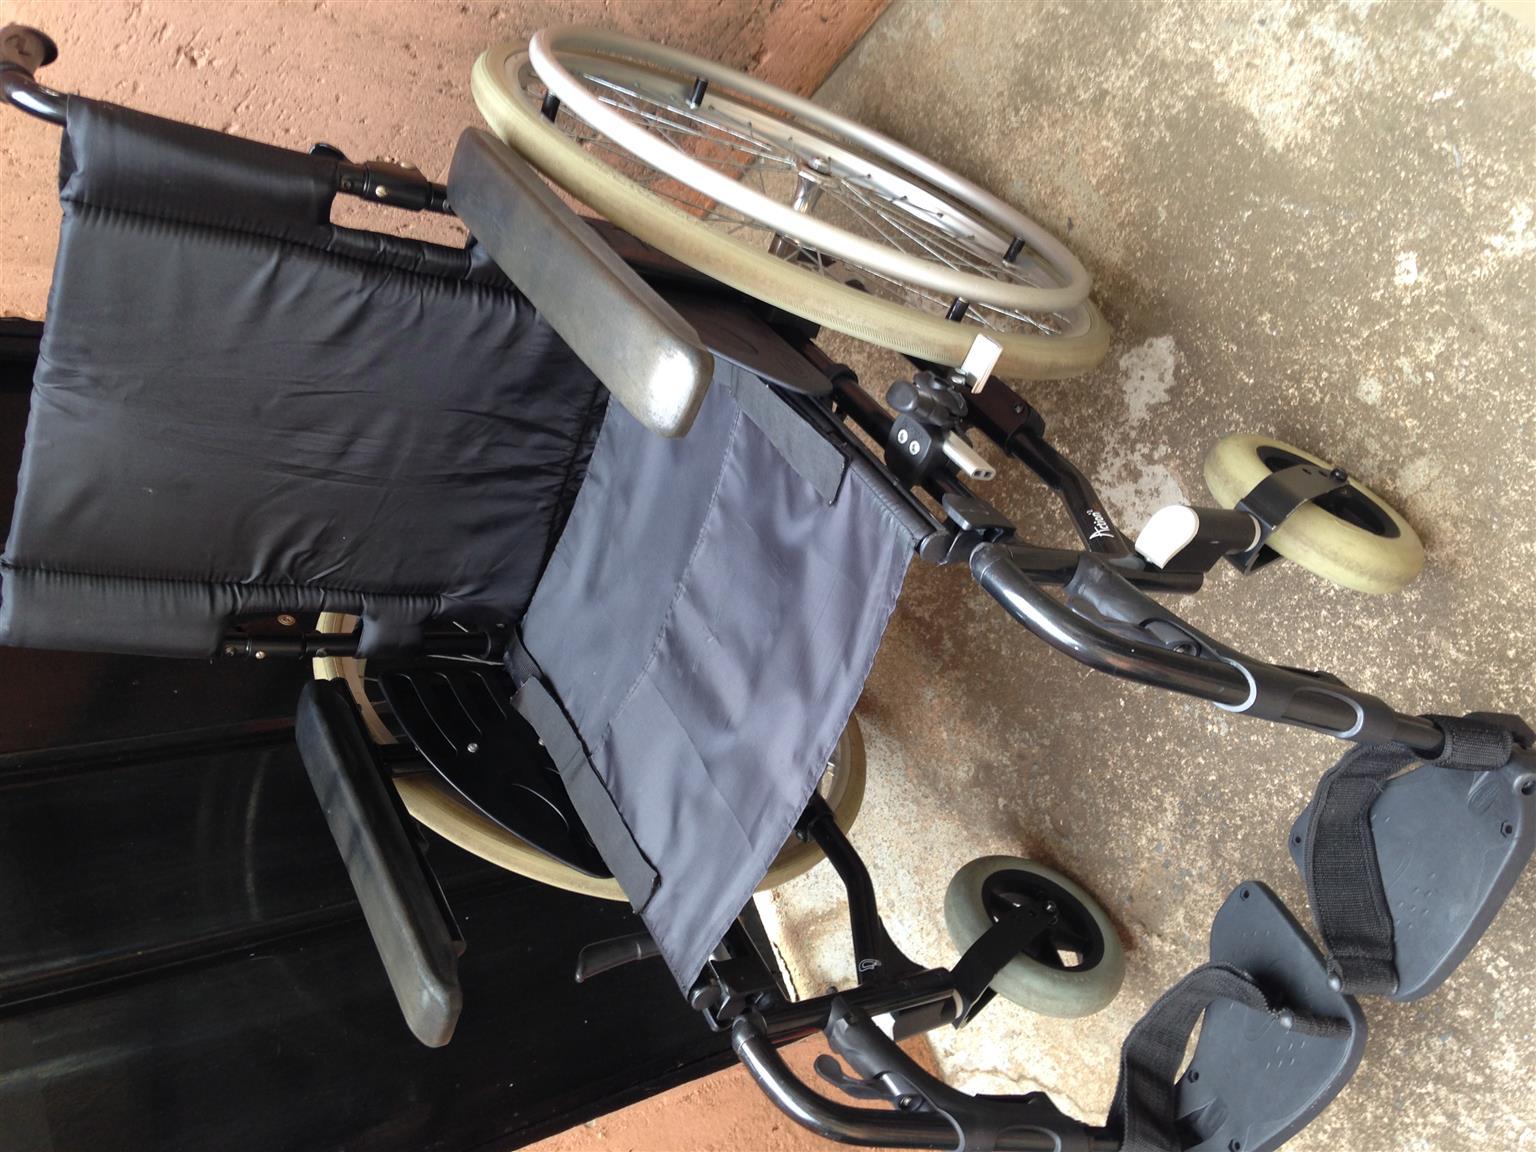 Invacare Action2 wheelchair